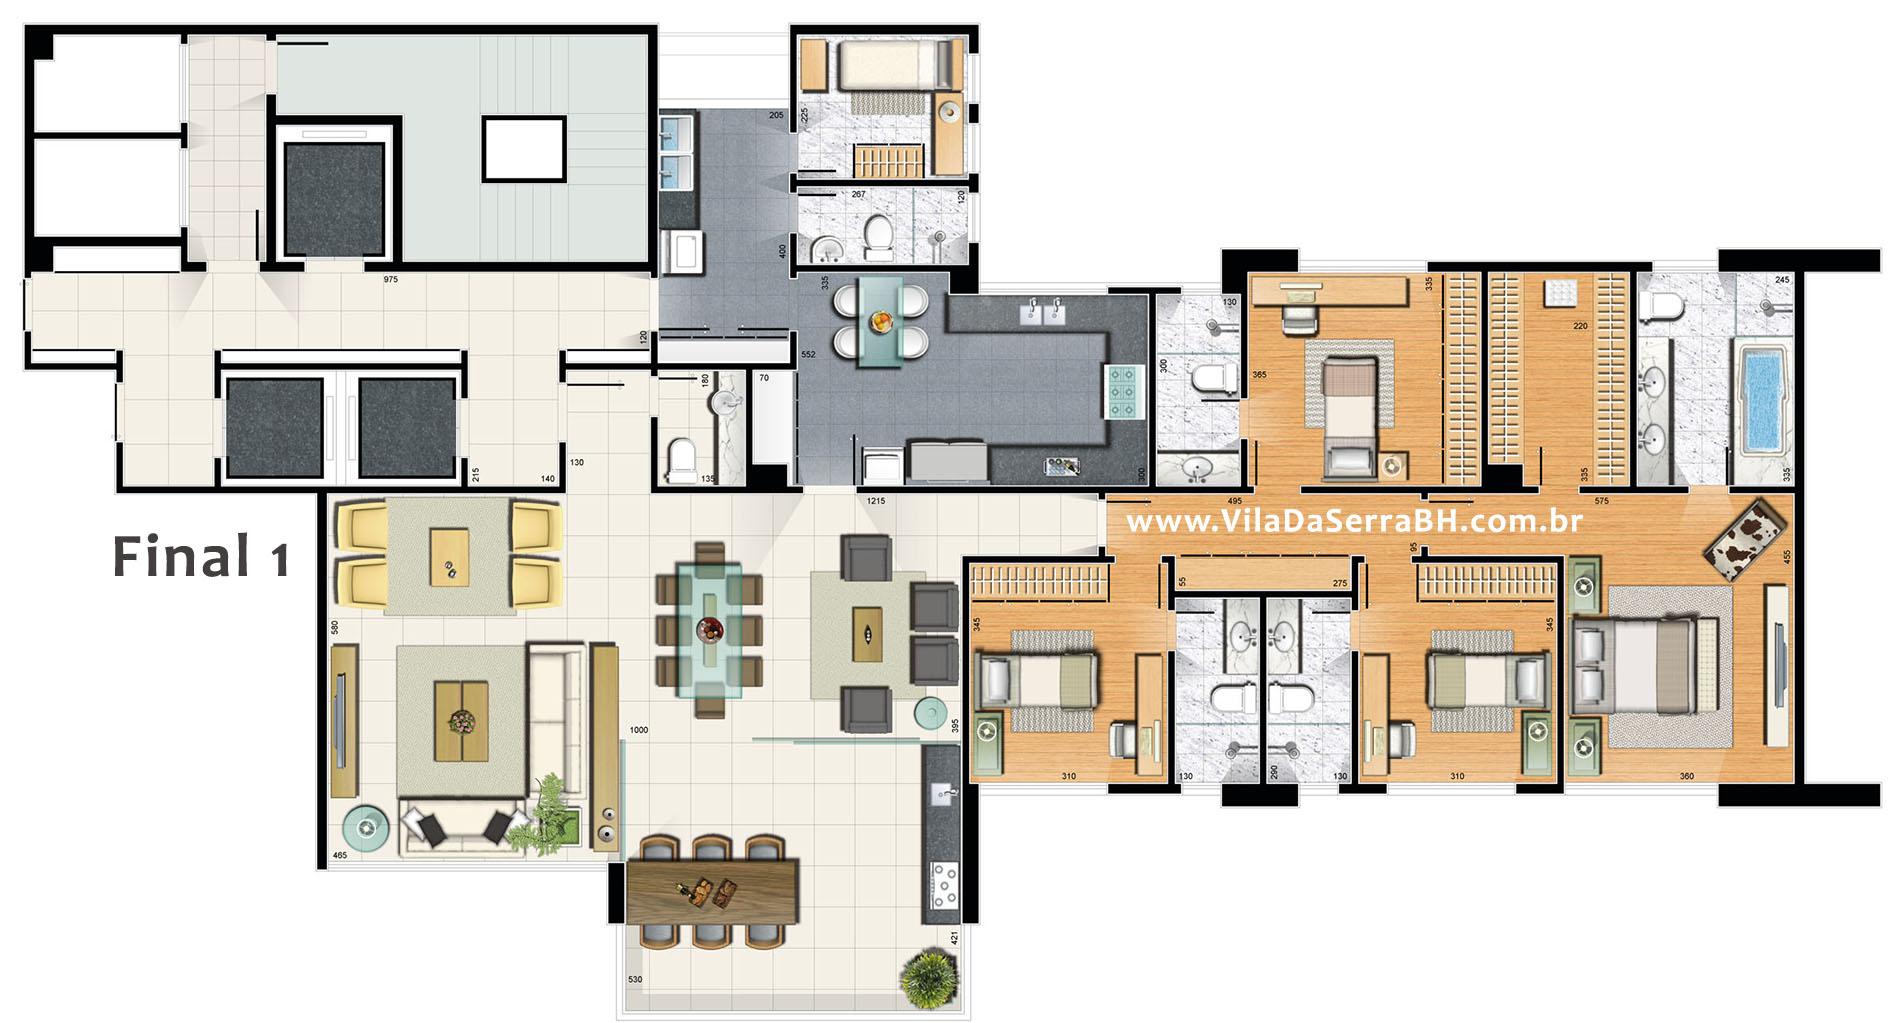 apartamento villa reale conartes vila da serra